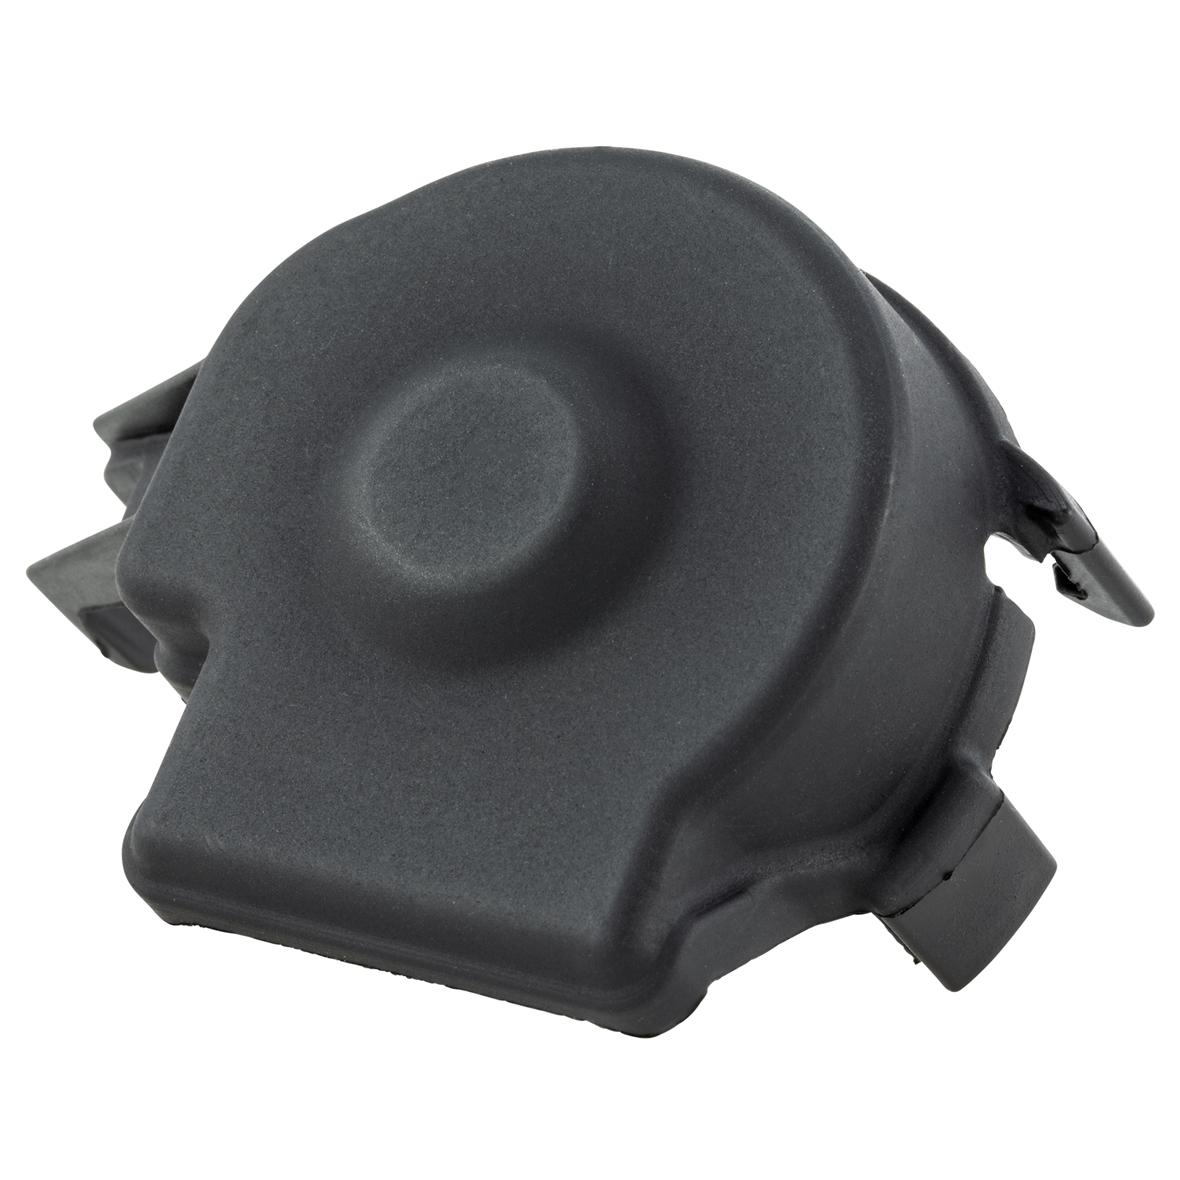 Product Image for 'Cap PIAGGIO throttle flapTitle'